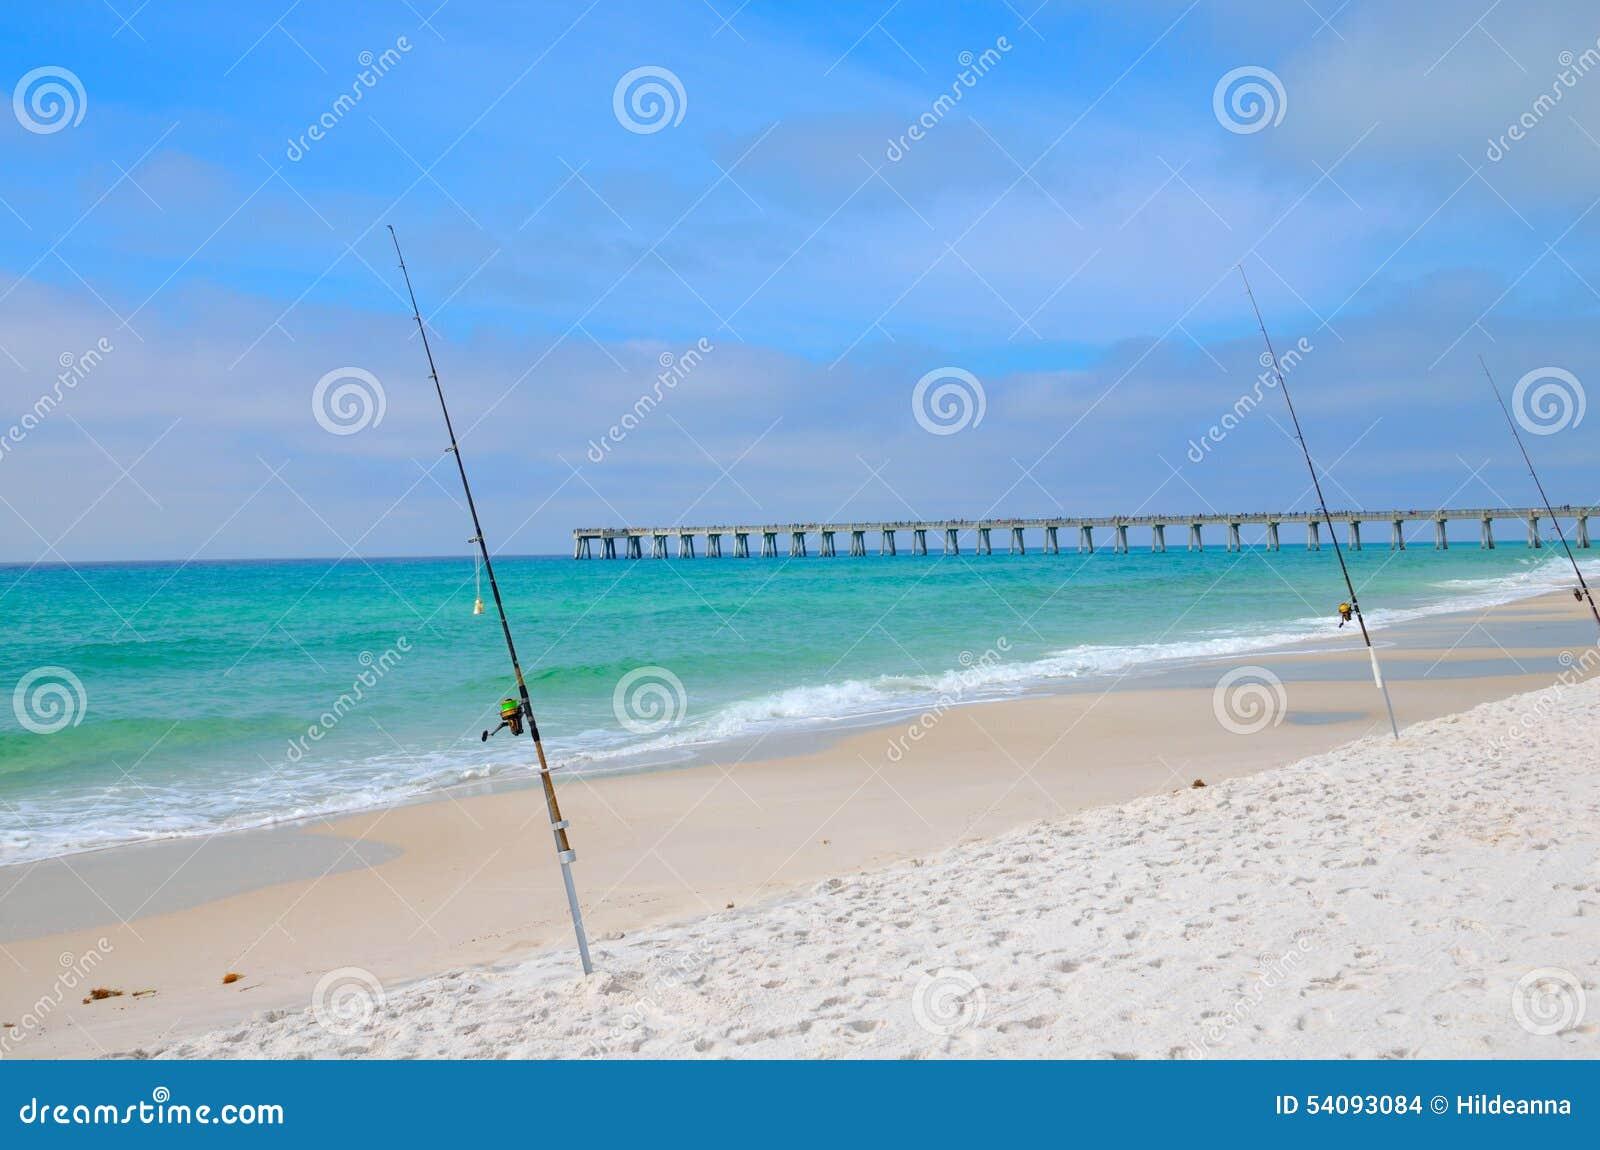 Fishing in the gulf of mexico panama city fl stock photo for Surf fishing panama city beach